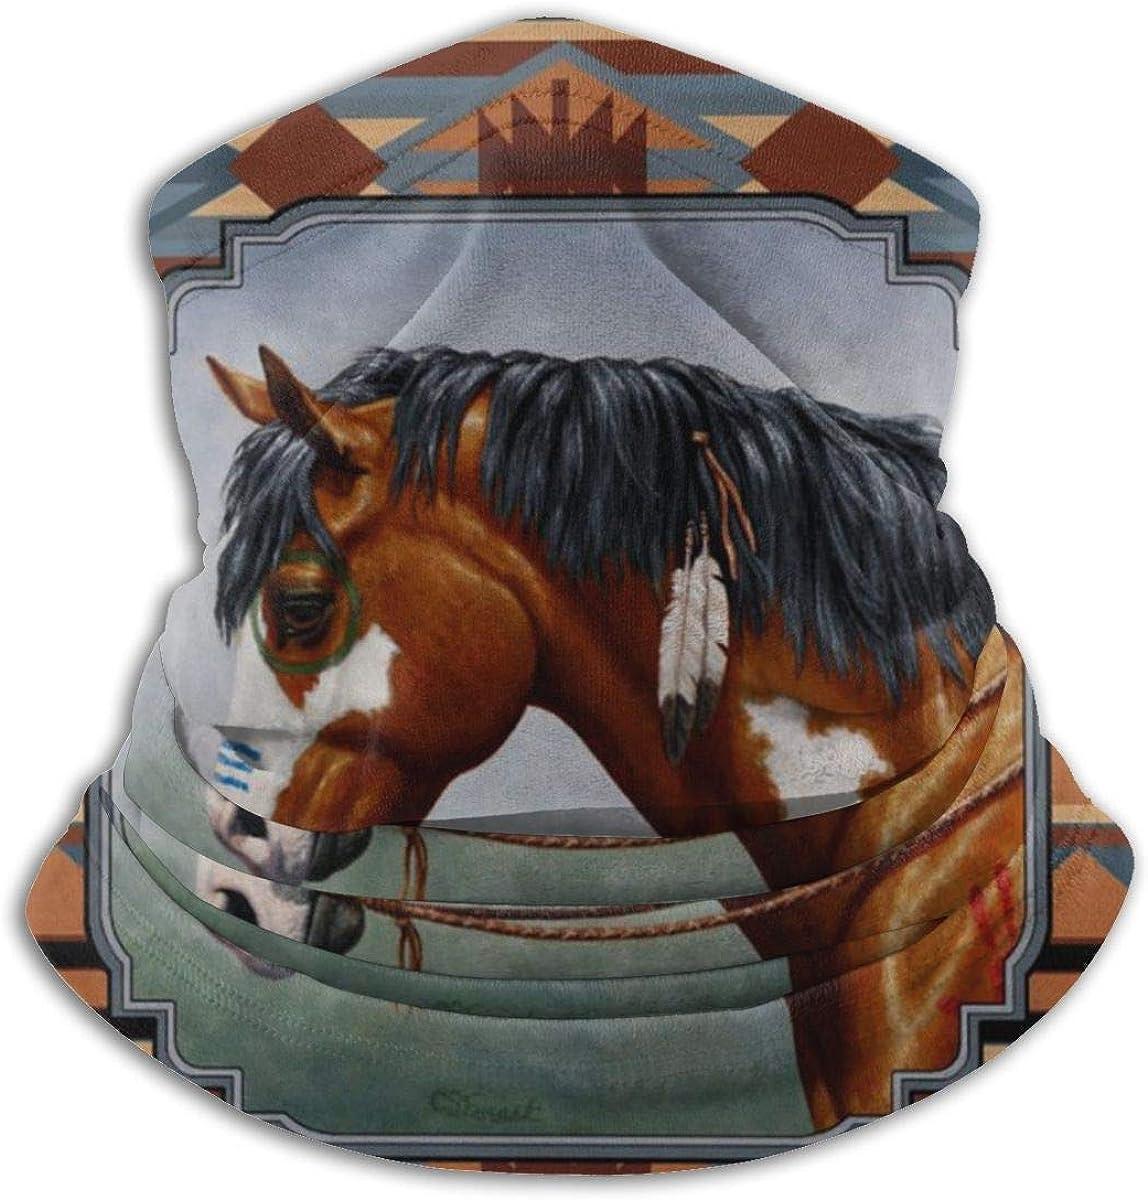 CLERO& Scarf Fleece Neck Warmer Indian War Horse Southwestern Southwestern Windproof Winter Neck Gaiter Cold Weather Face Mask for Men Women